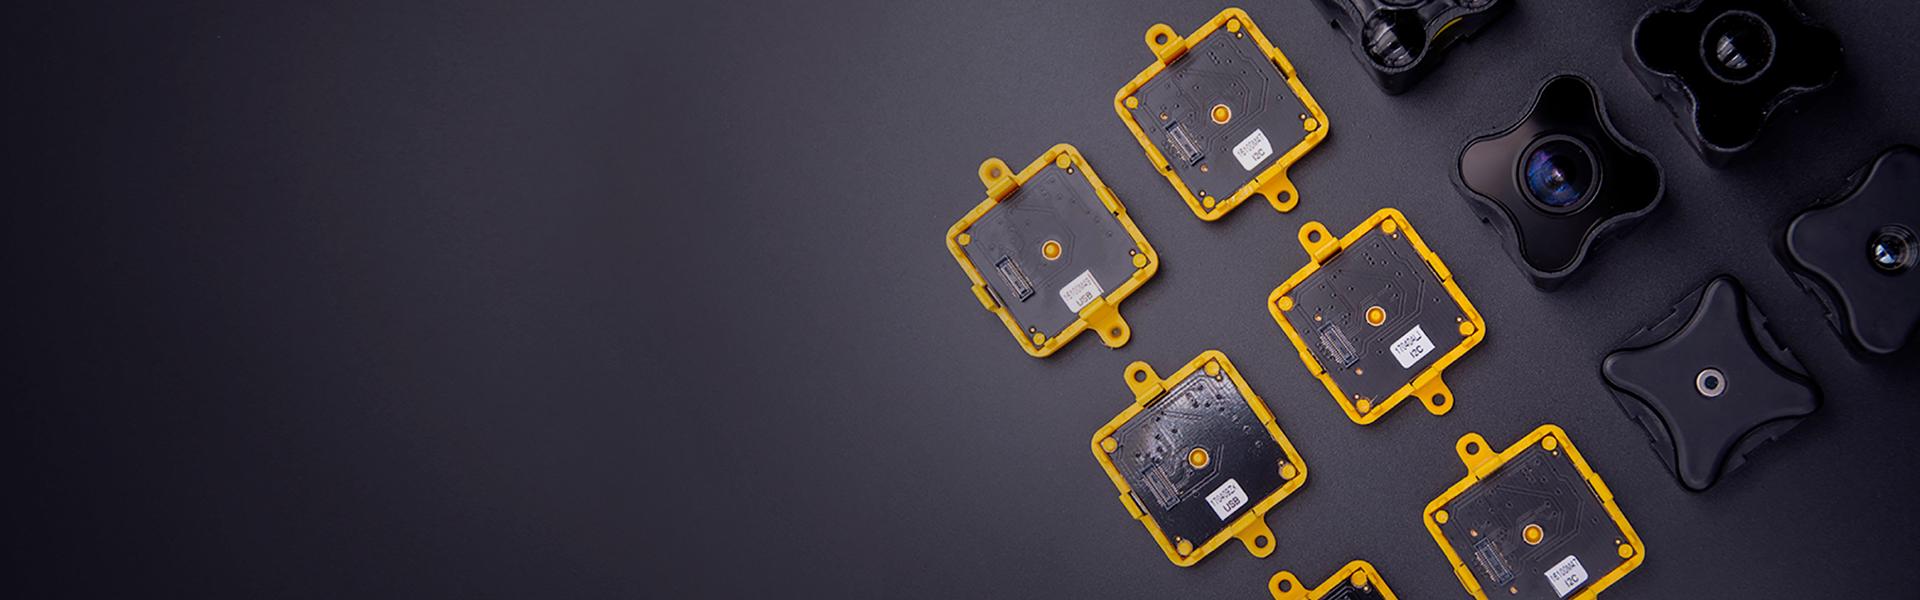 Evaluation Kit Sensor Modules